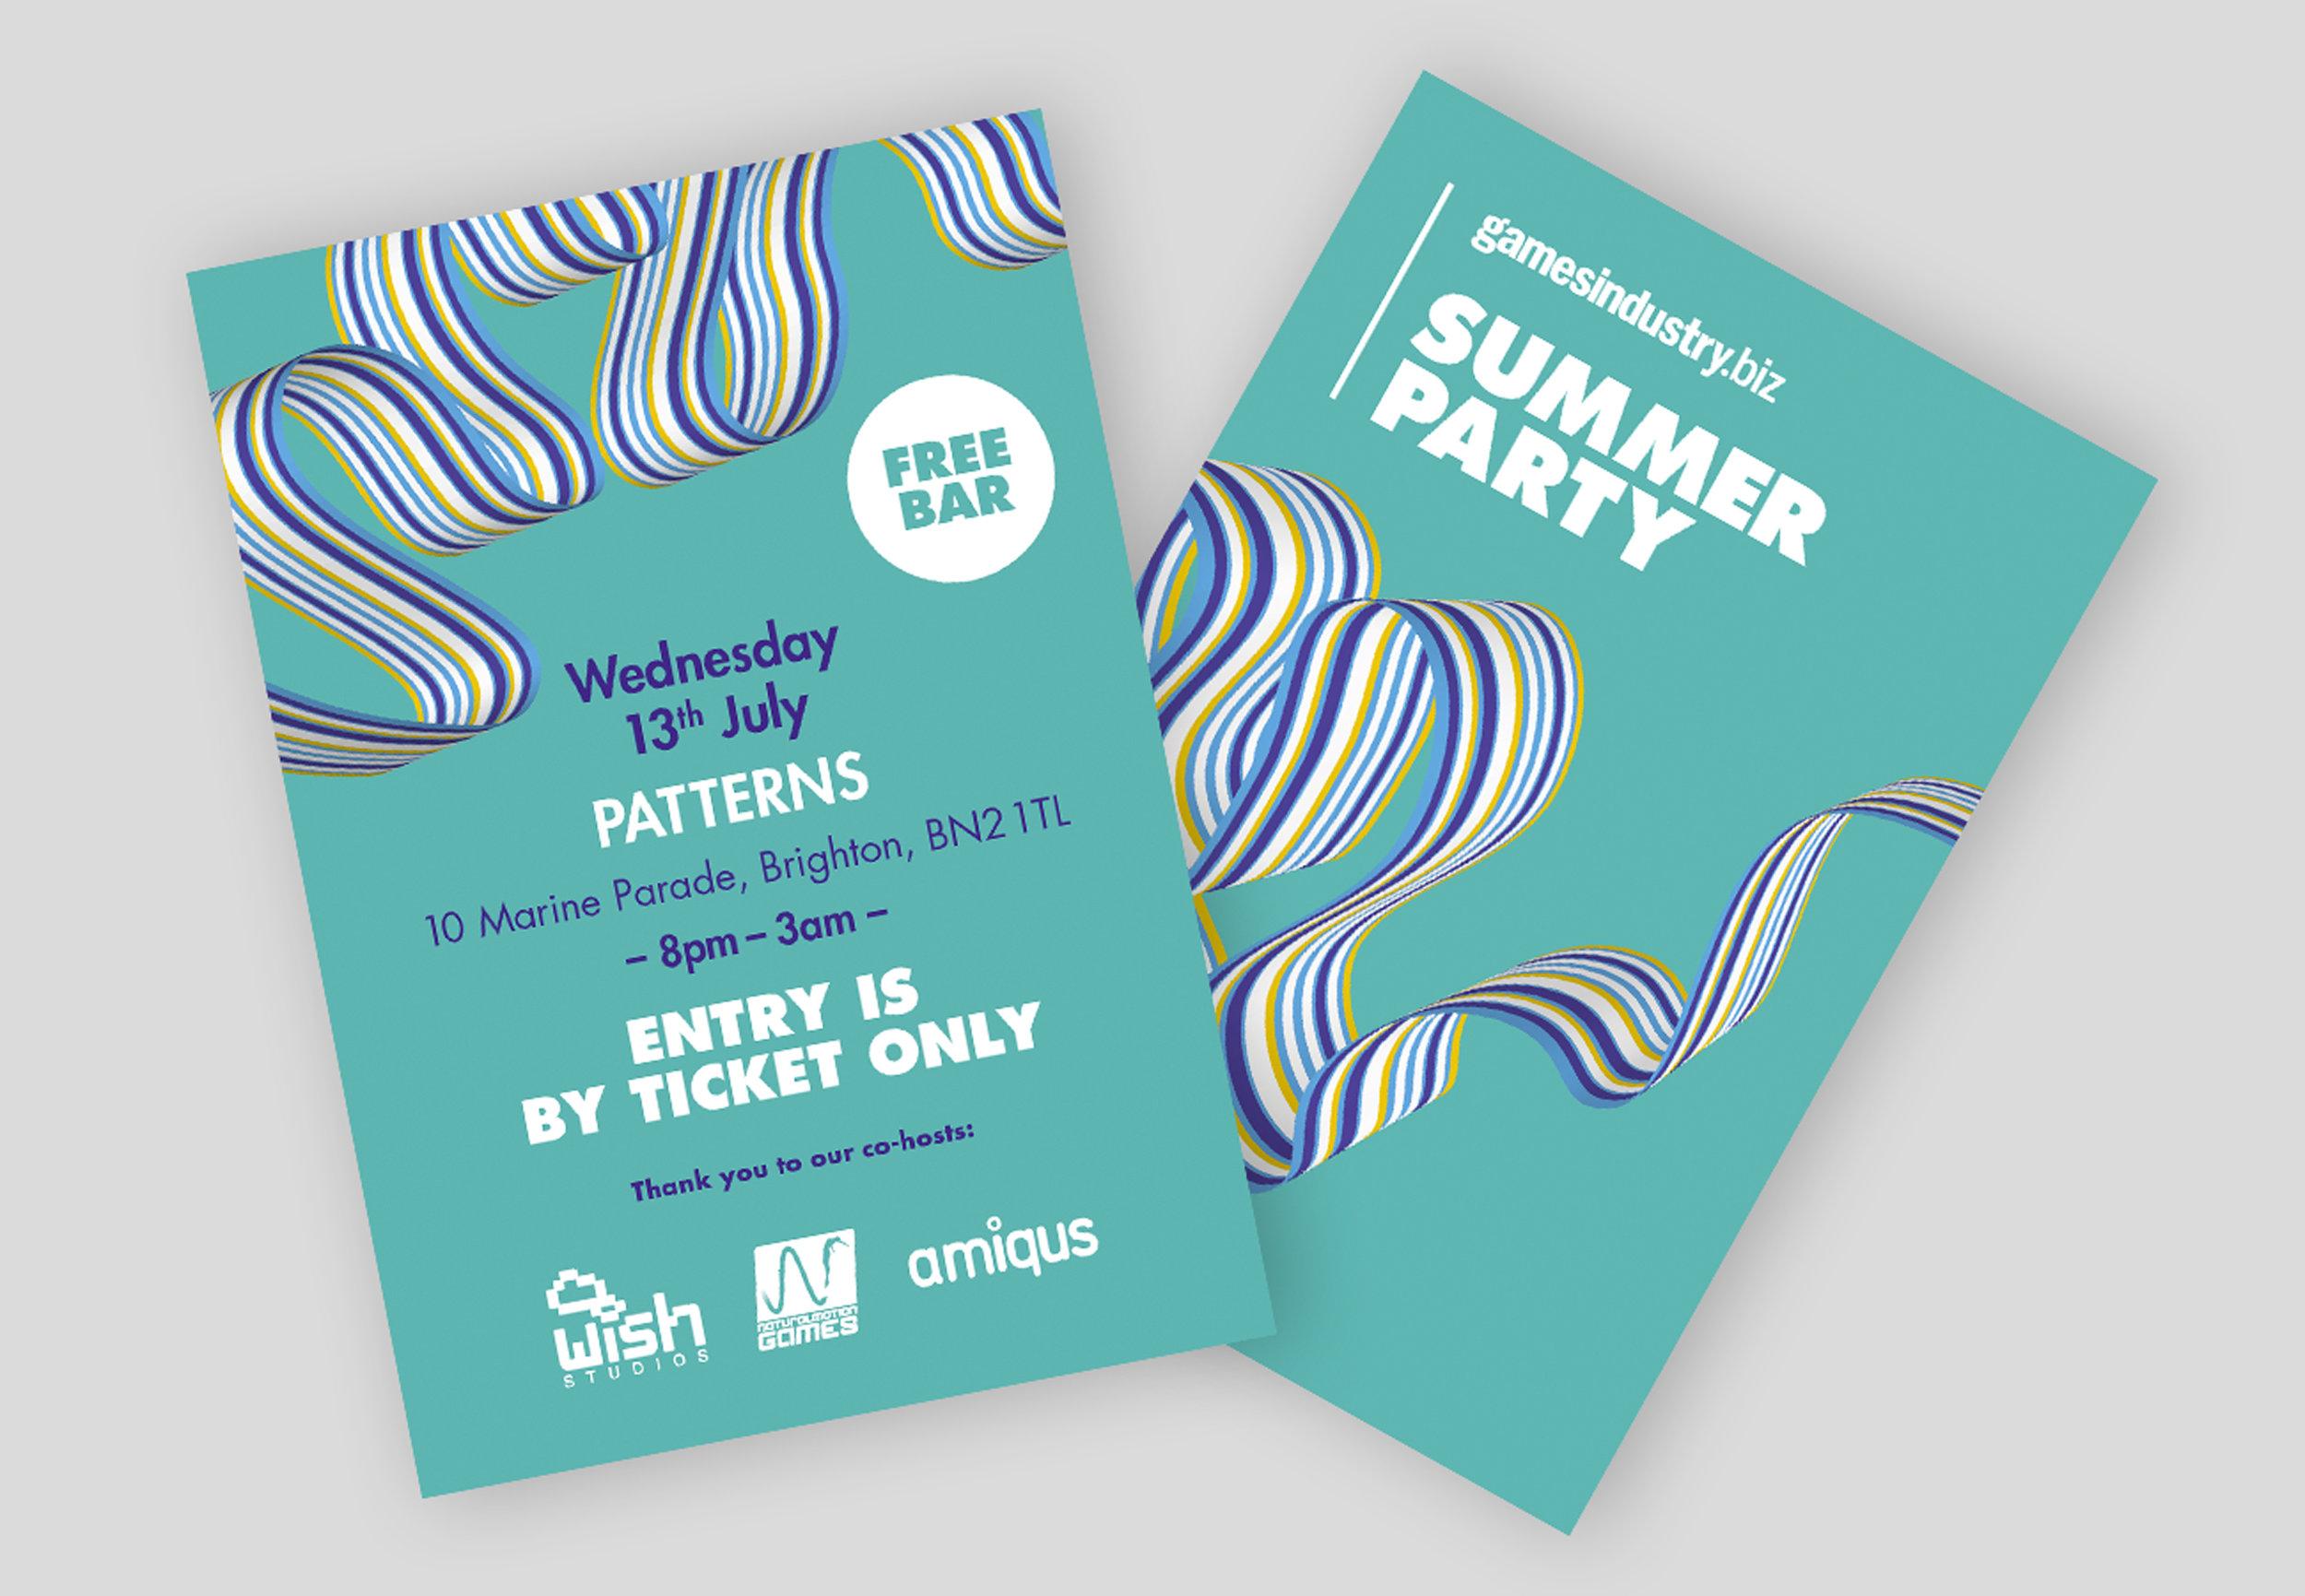 Sumer-party-flyer-mock.jpg